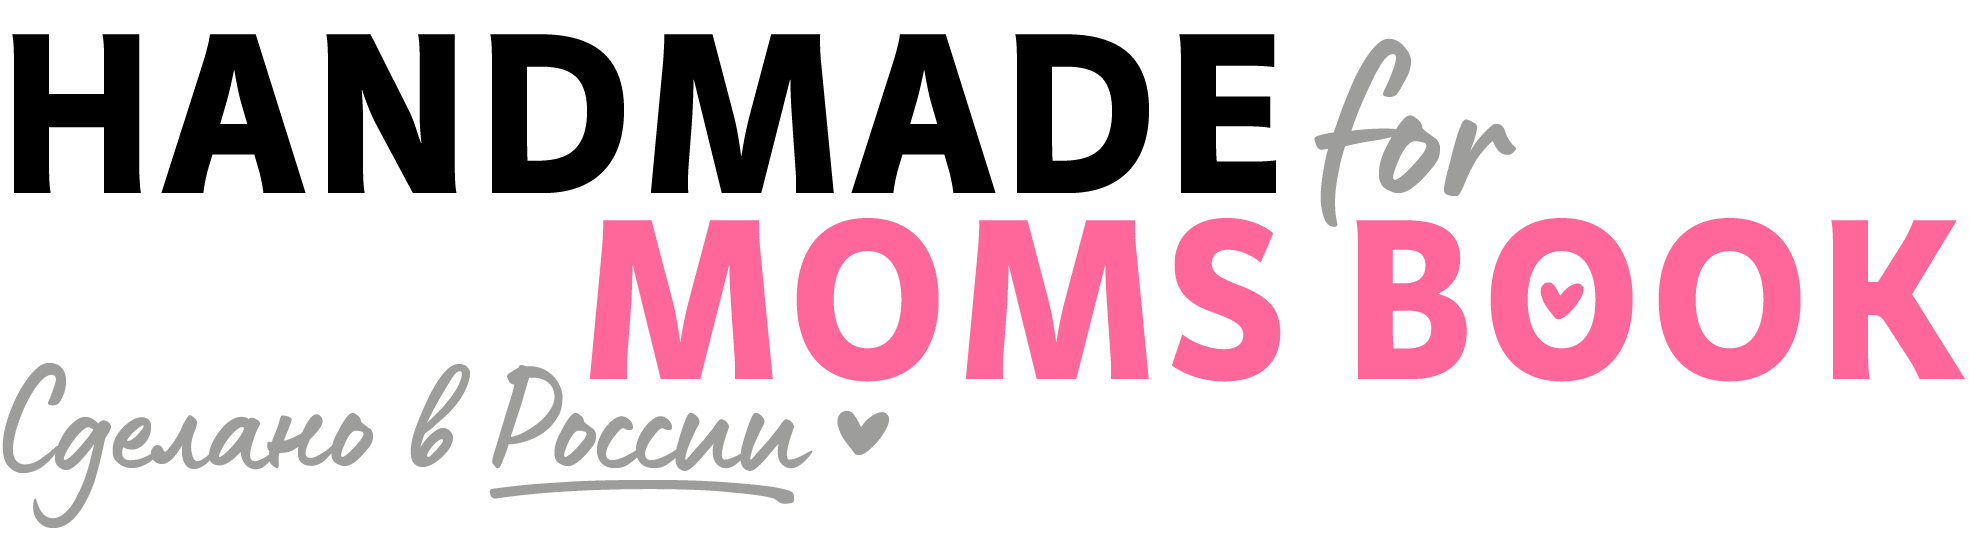 Moms Book © Интернет-магазин альбома-дневника о развитии ребенка